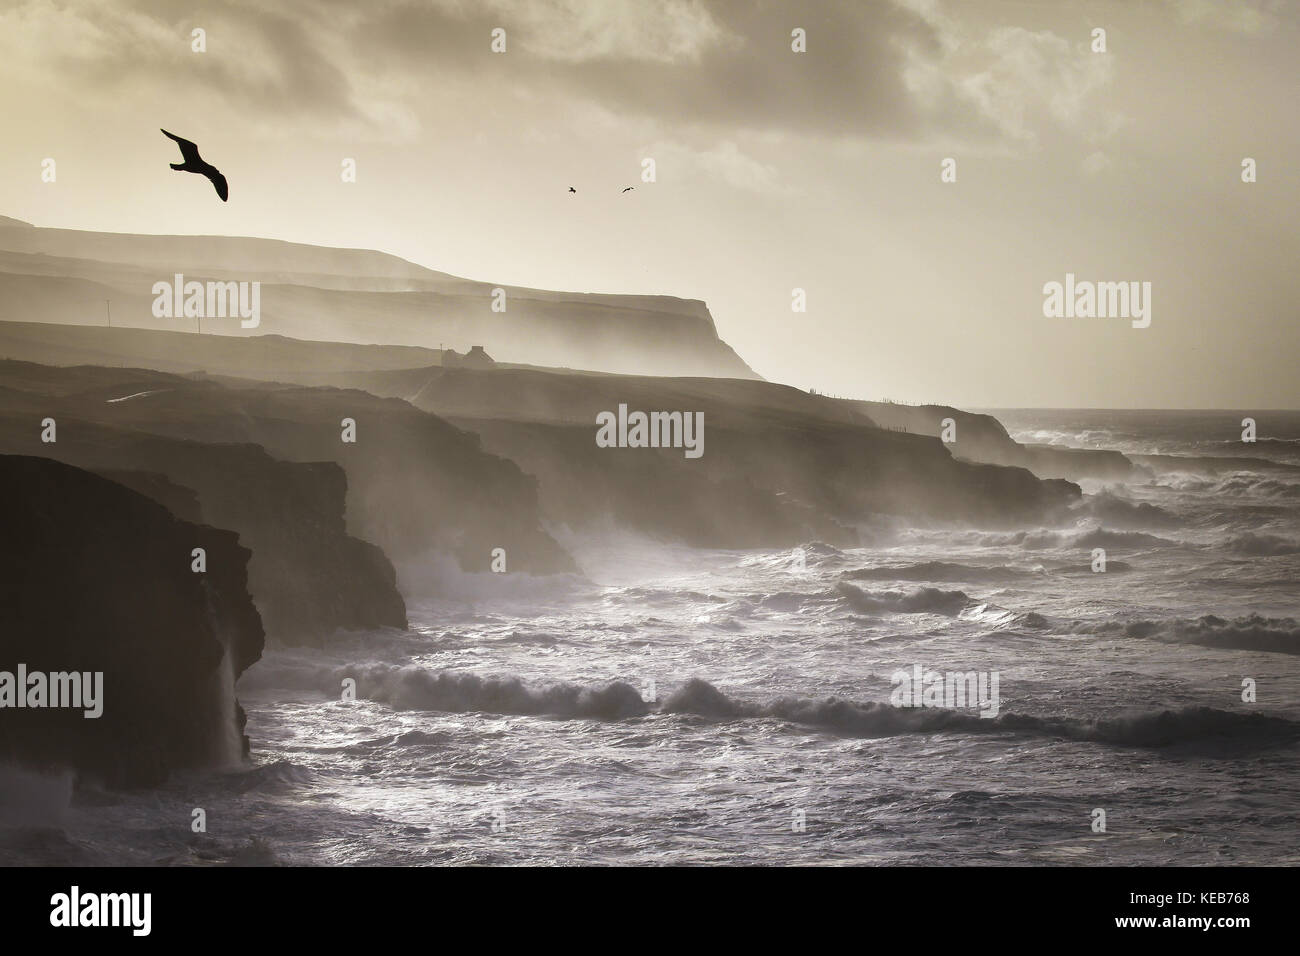 Birds flying along the cliffs of Moher near doolin - Stock Image